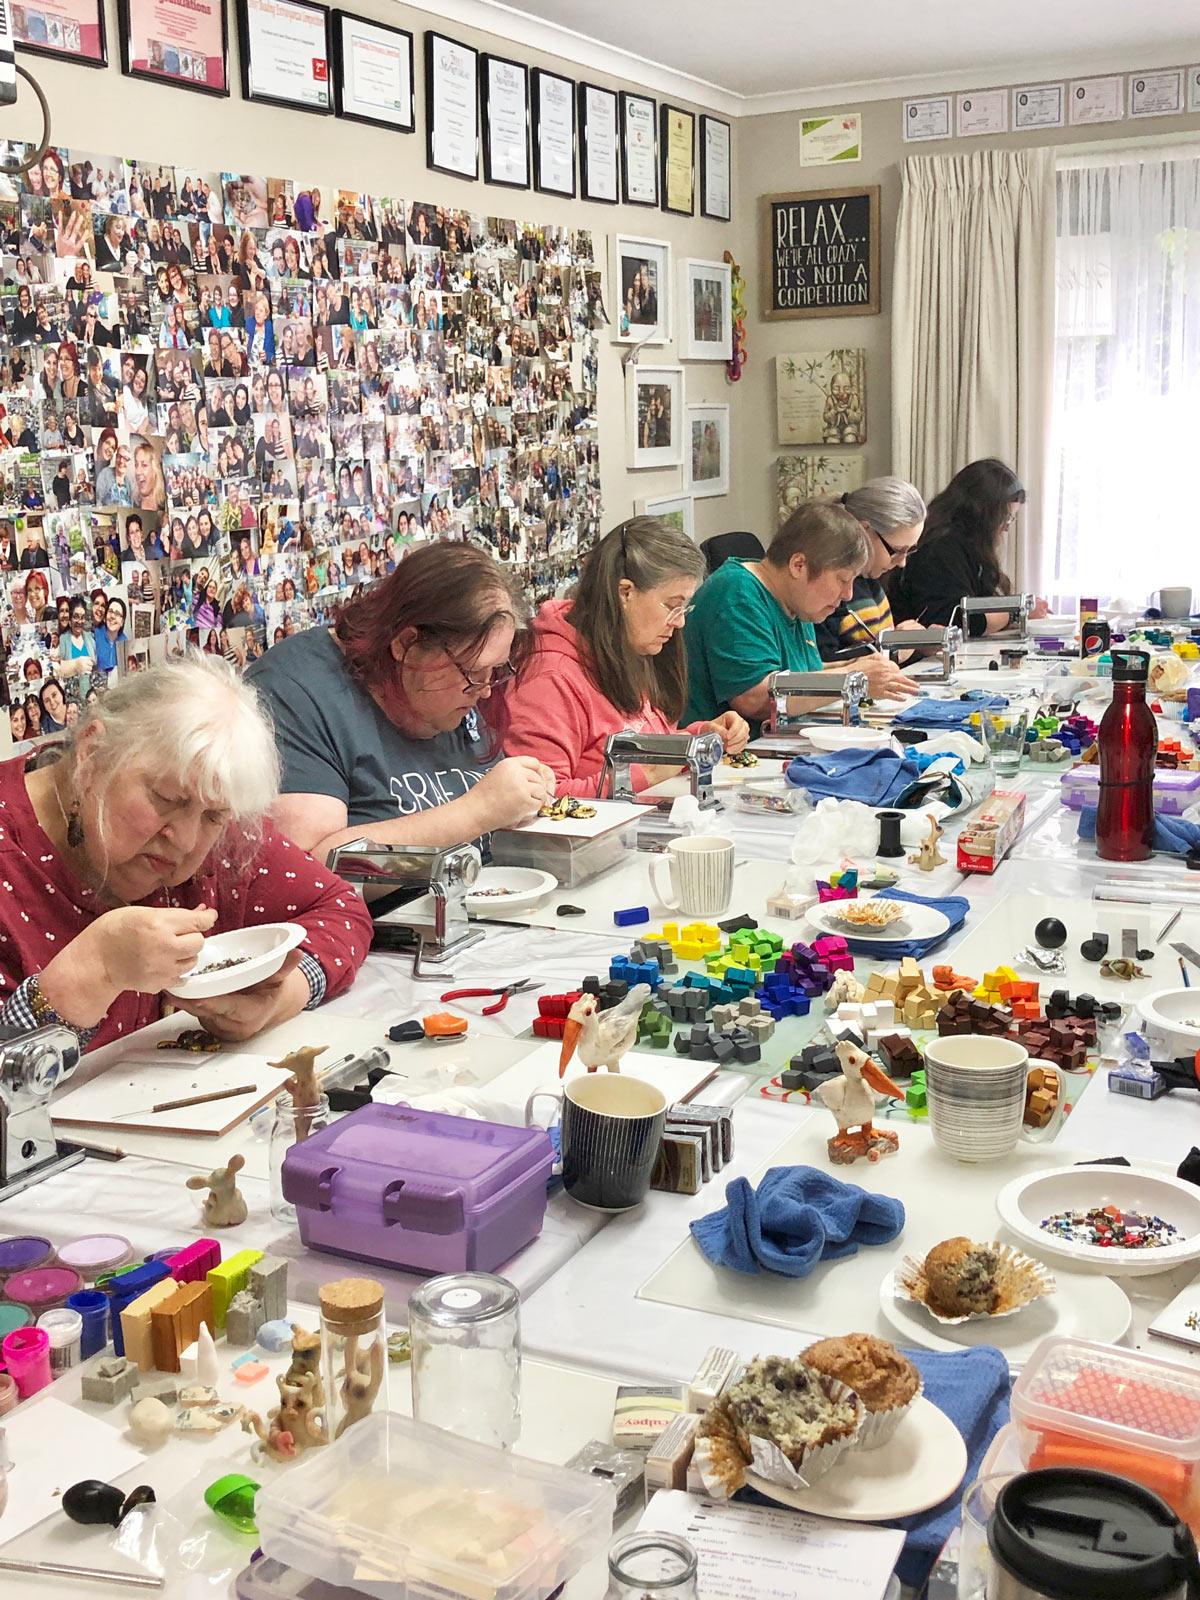 The Whimsical Bead Workshops